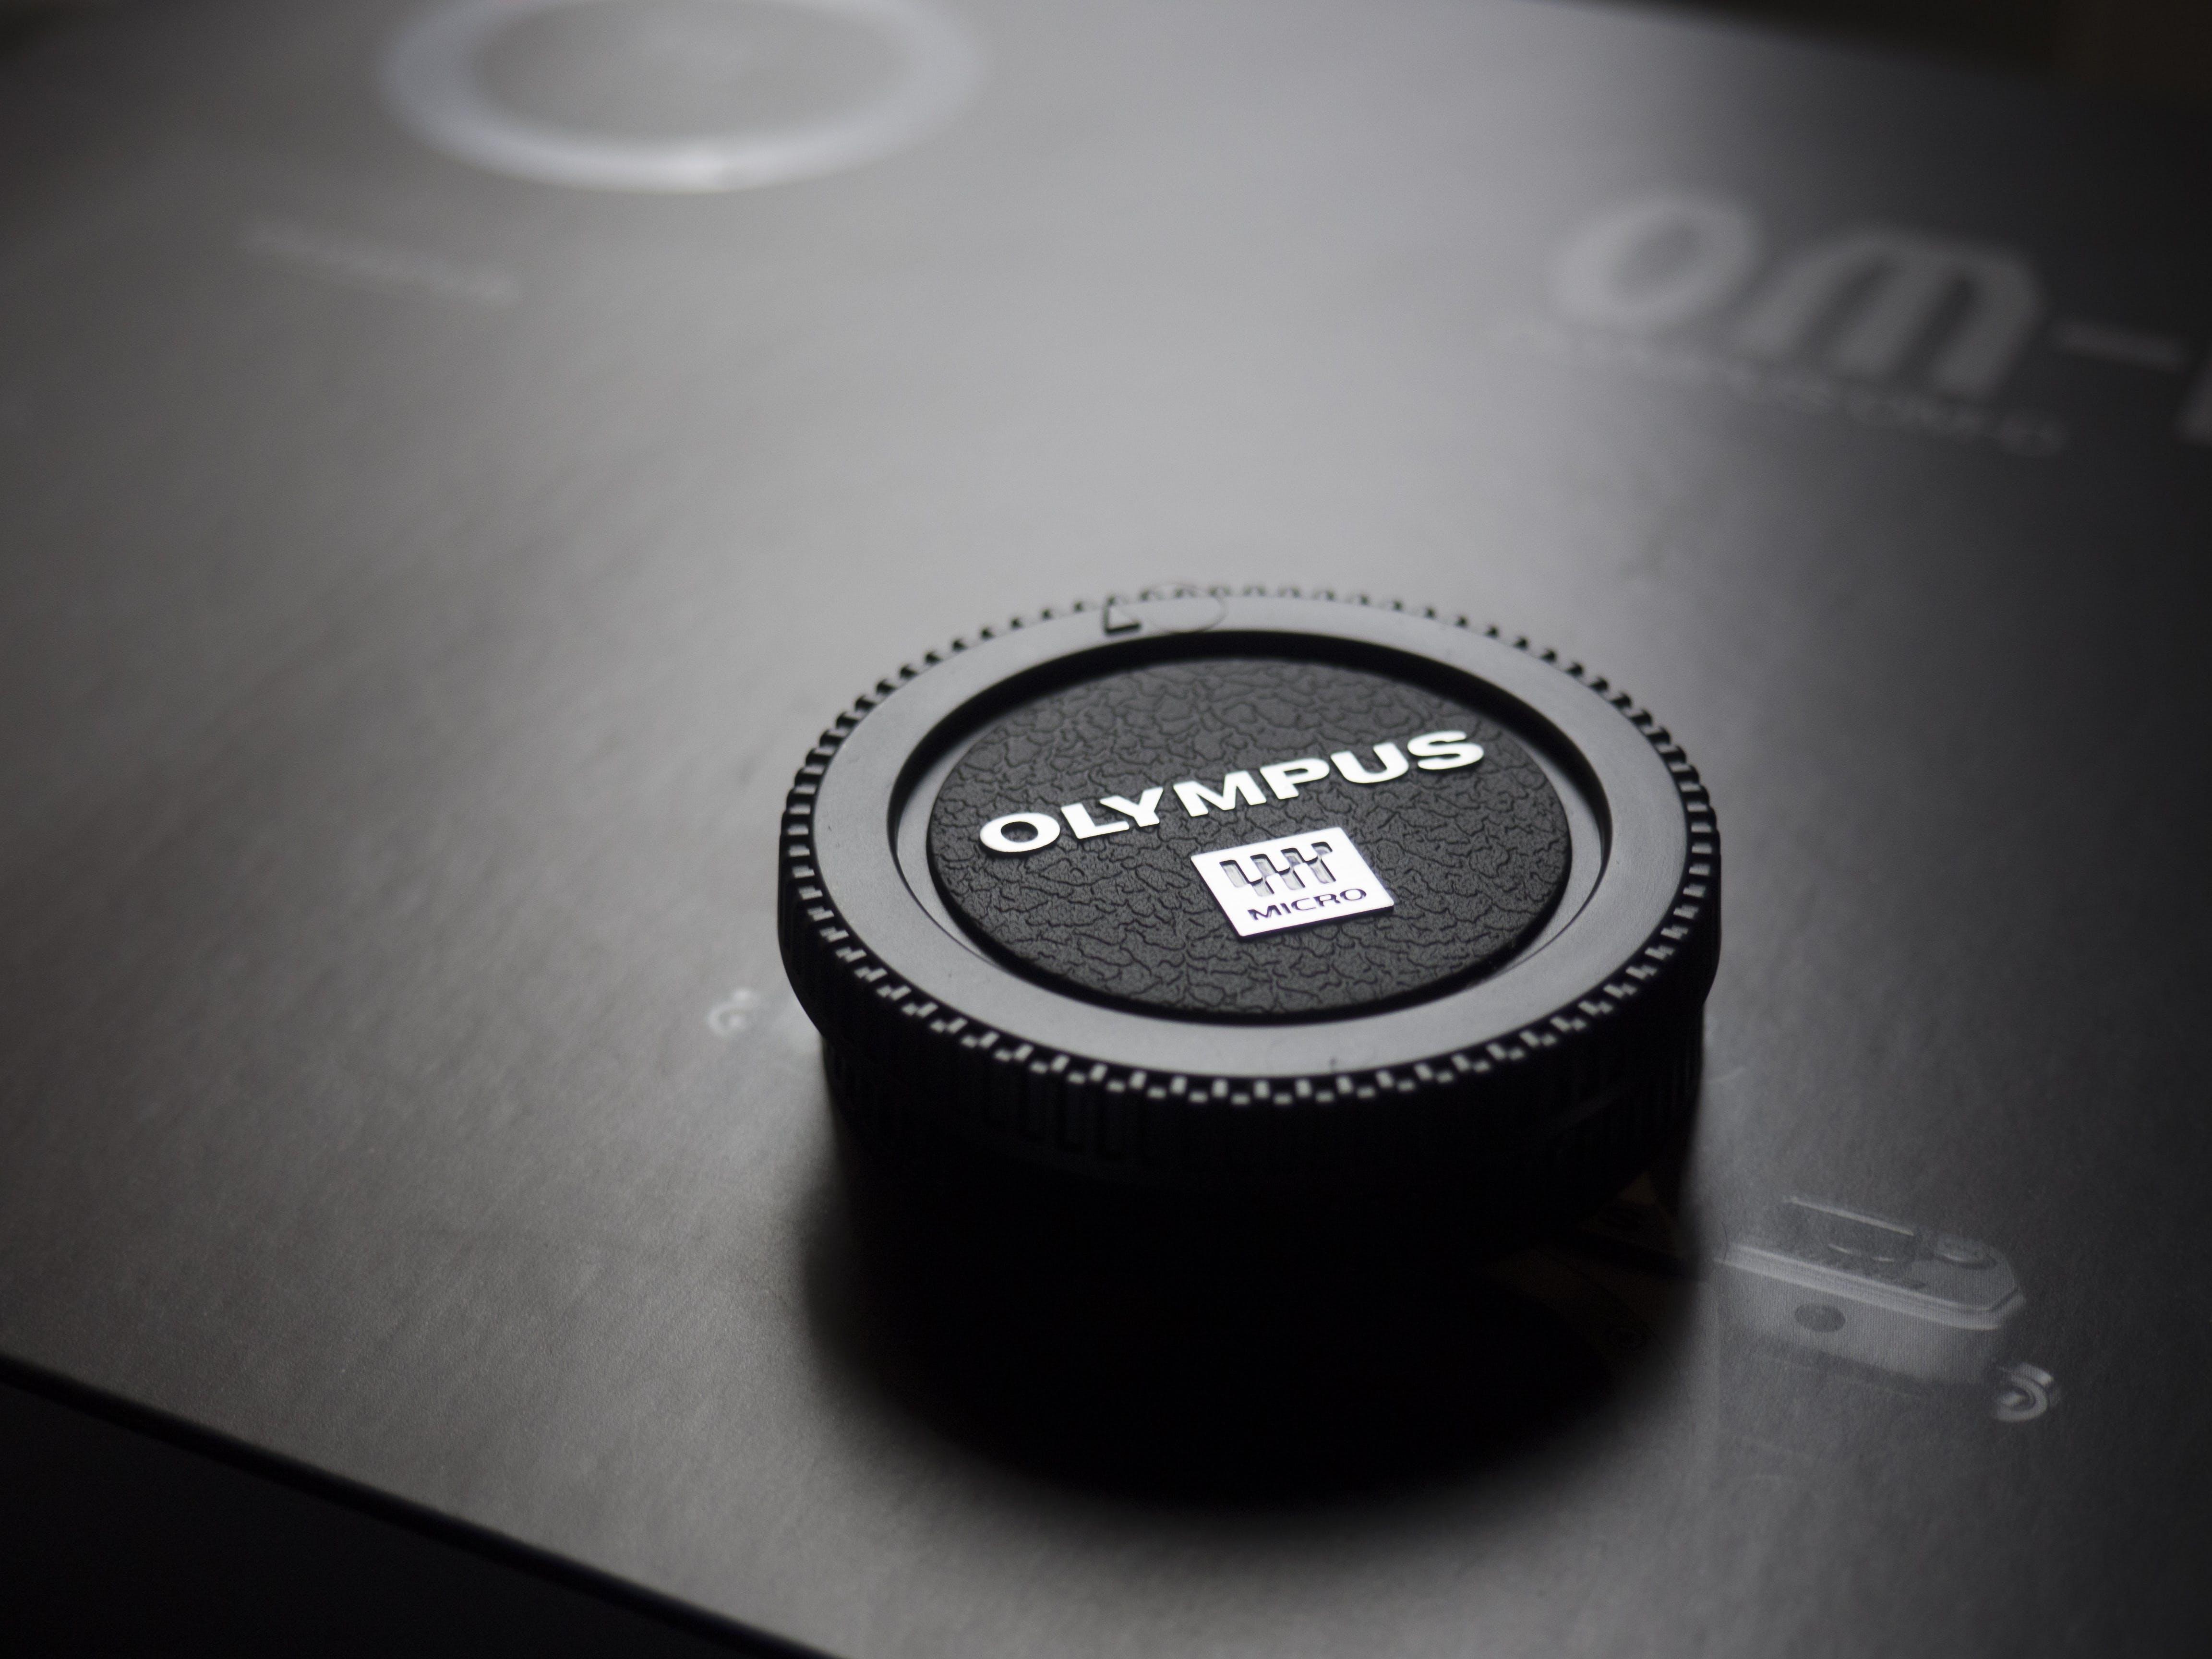 Olympus Camera Lens Cap Placed on Box